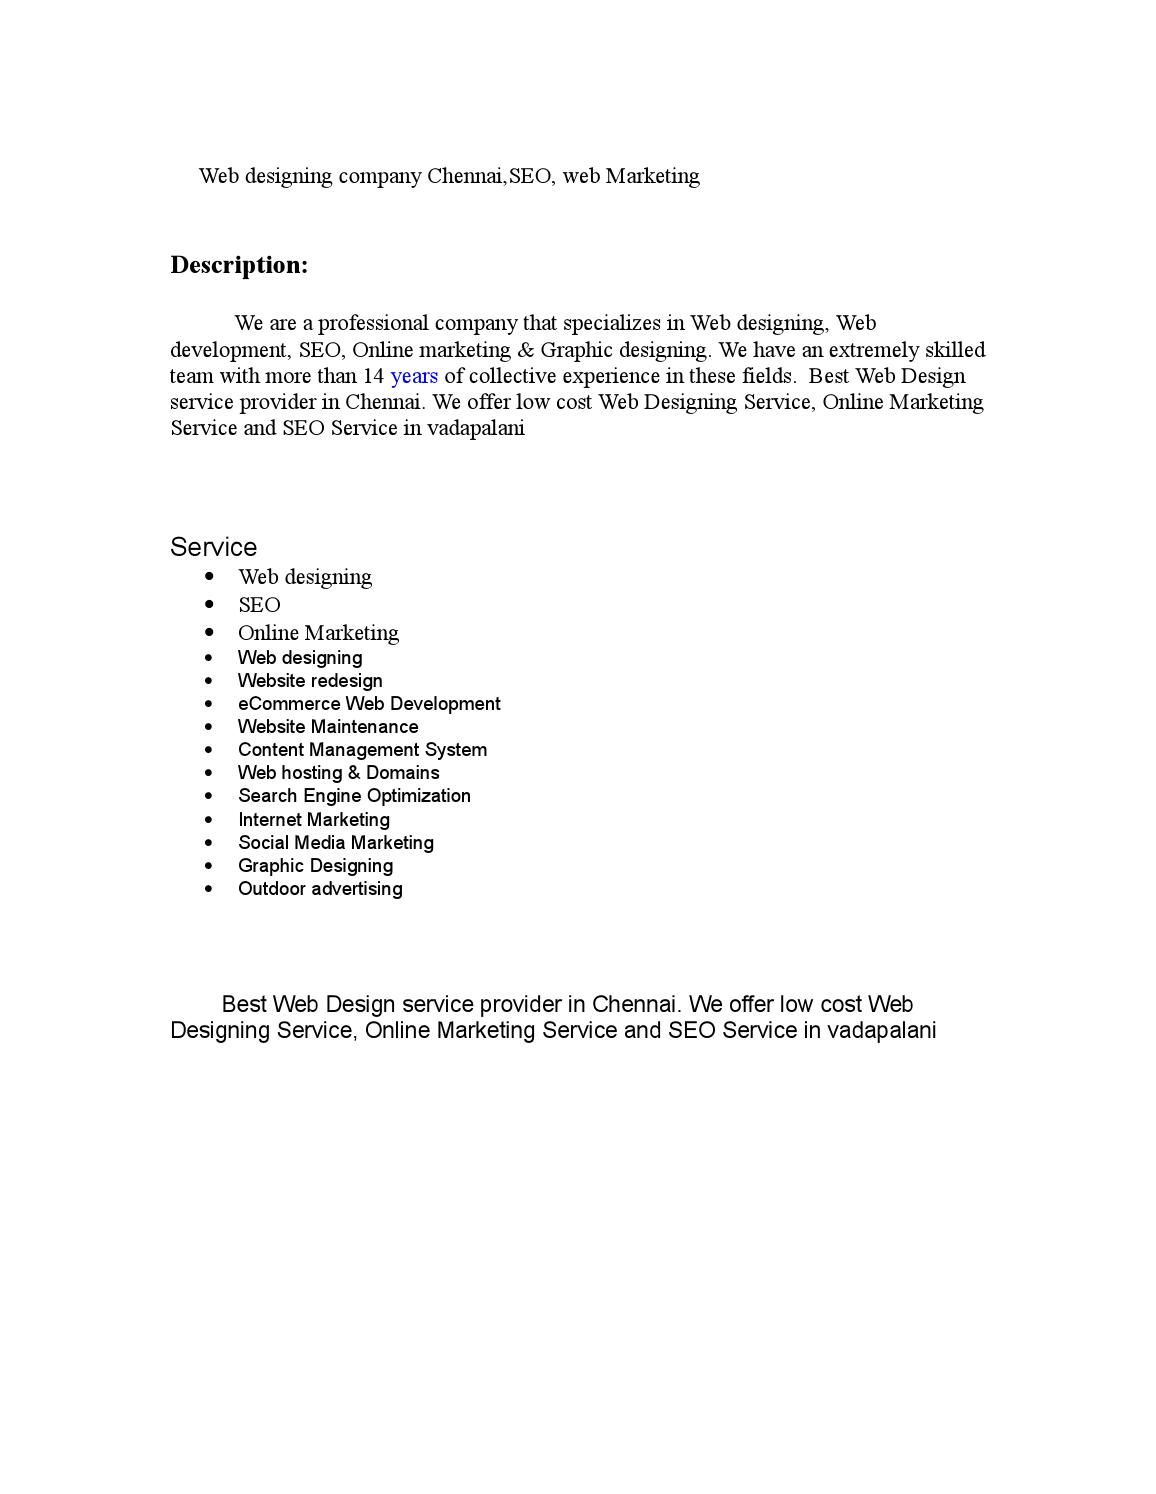 Web Designing Company Chennai Seo Web Marketing Web Marketing Web Design Company Web Design